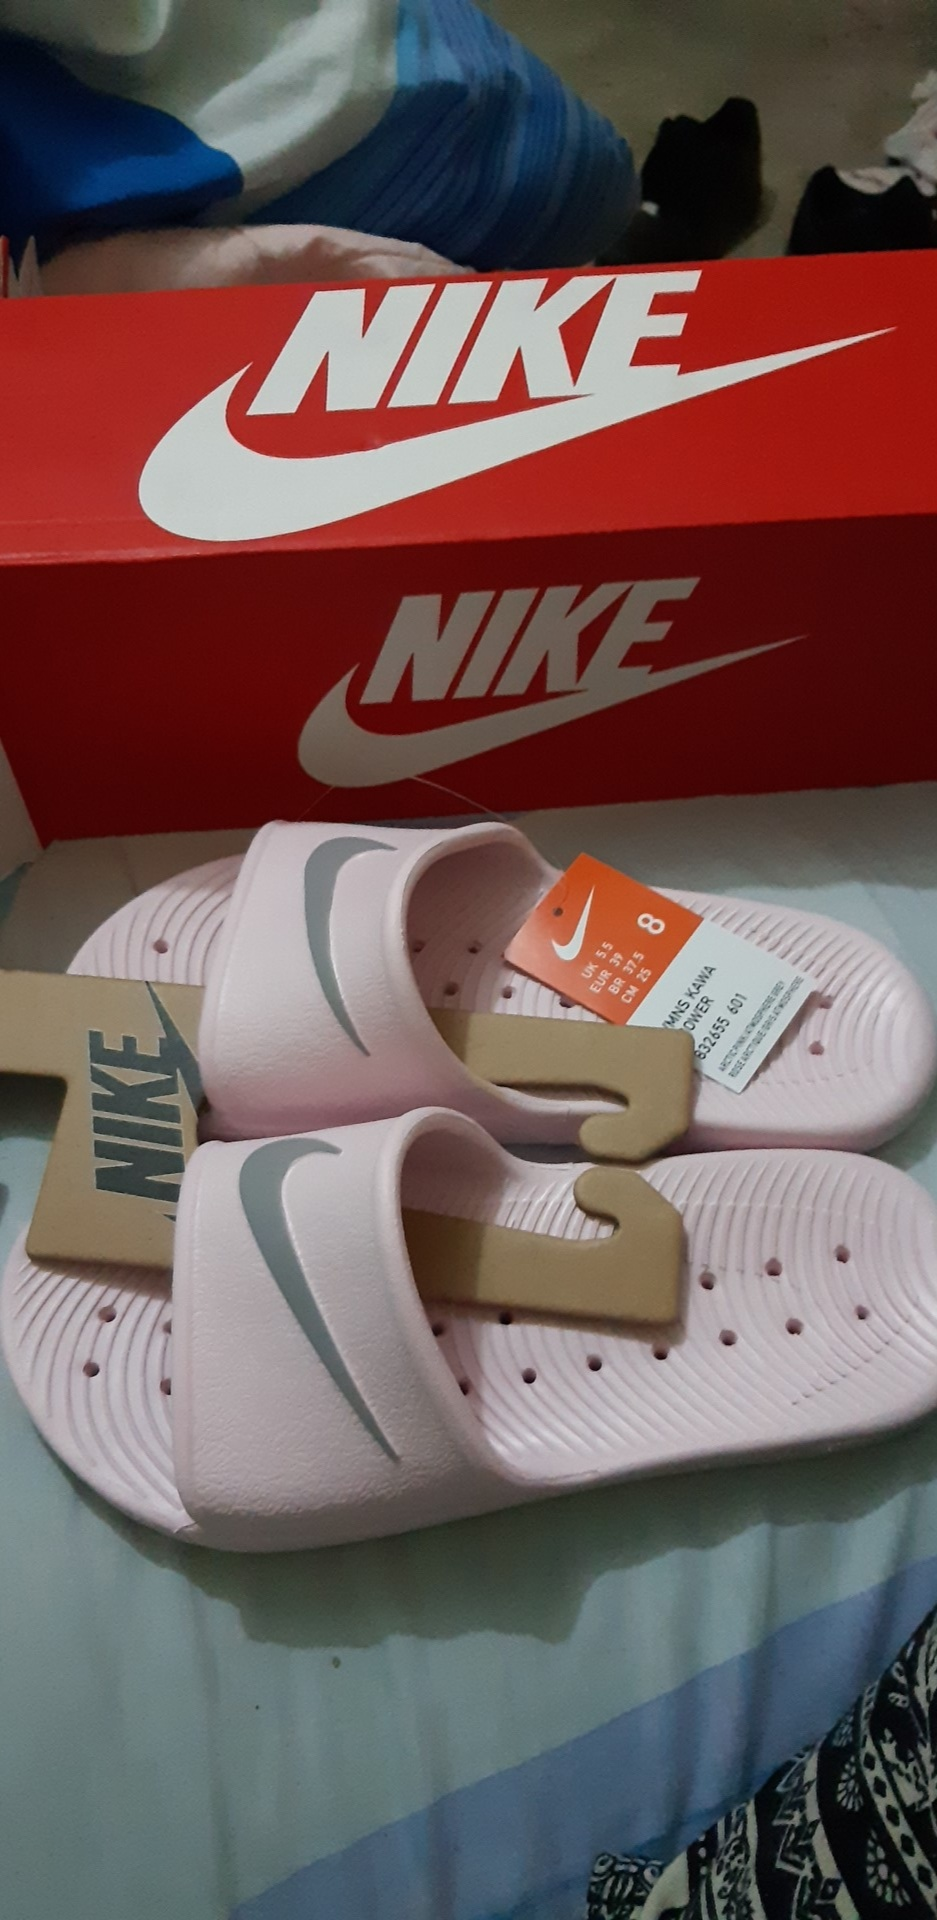 Filosófico préstamo Comportamiento  Nike WMNS KAWA SHOWER Blanco / dorado Sandalias deportivas y slides |  platanitos.com